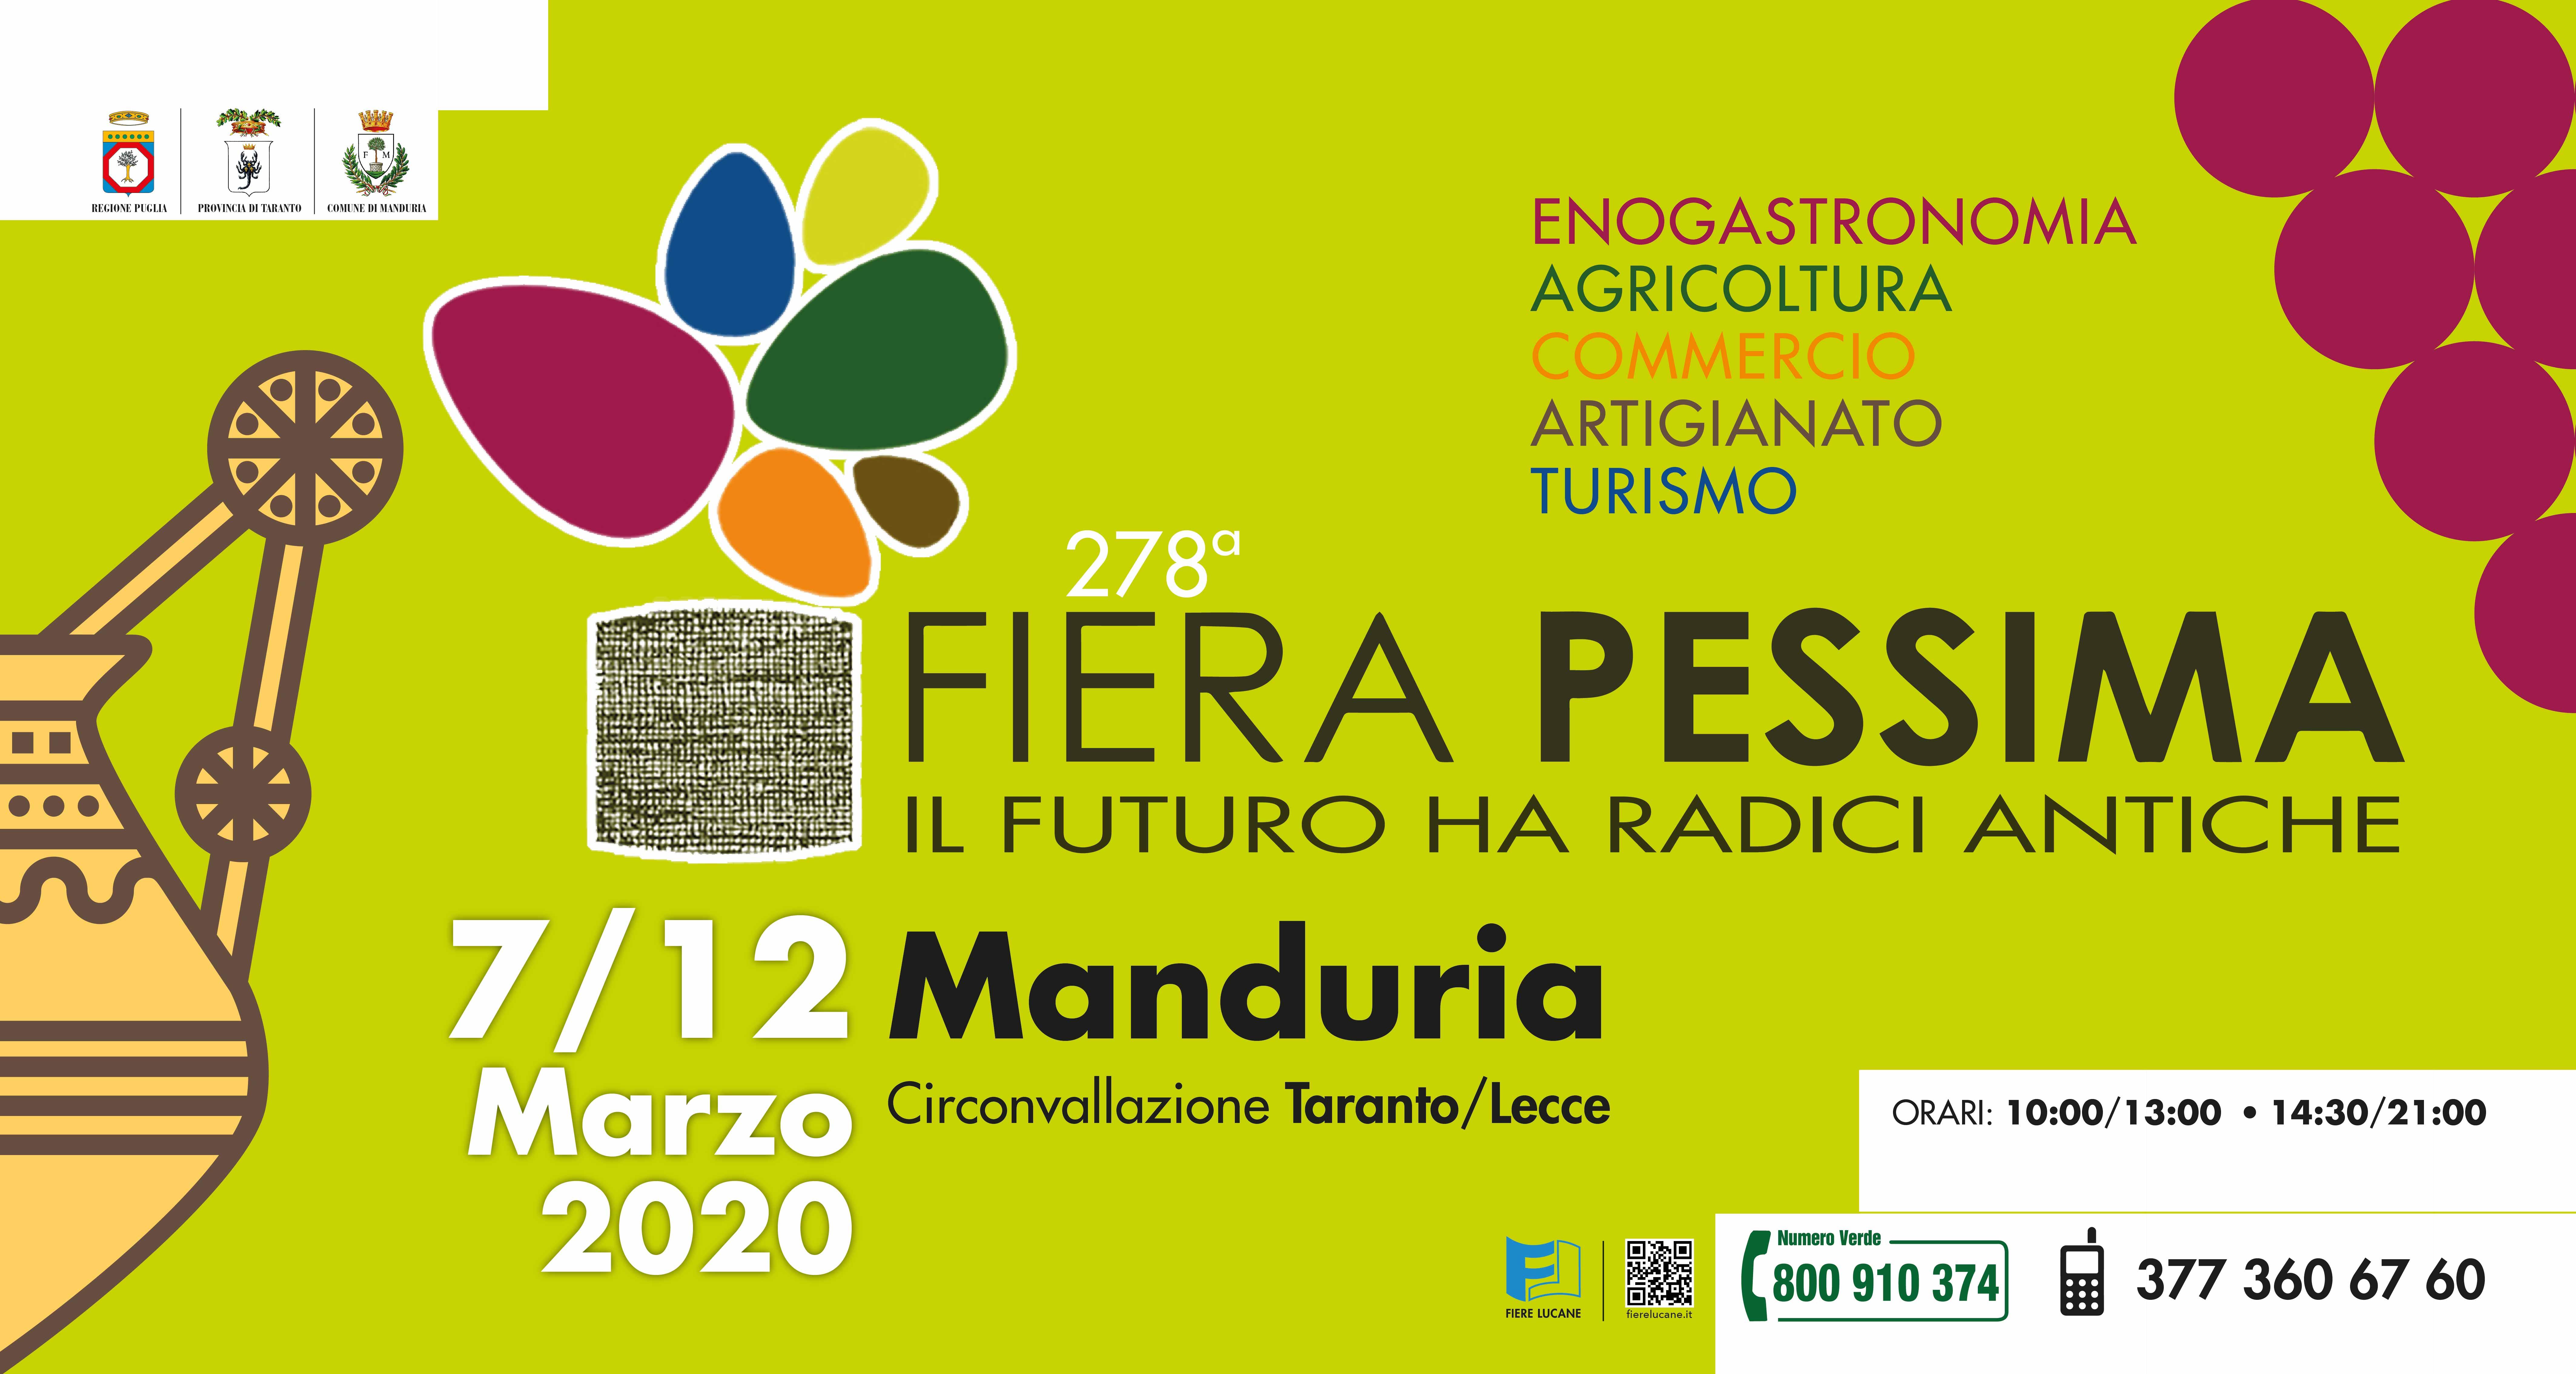 Banner-300x160_Fiera-Pessima-Manduria_03-012